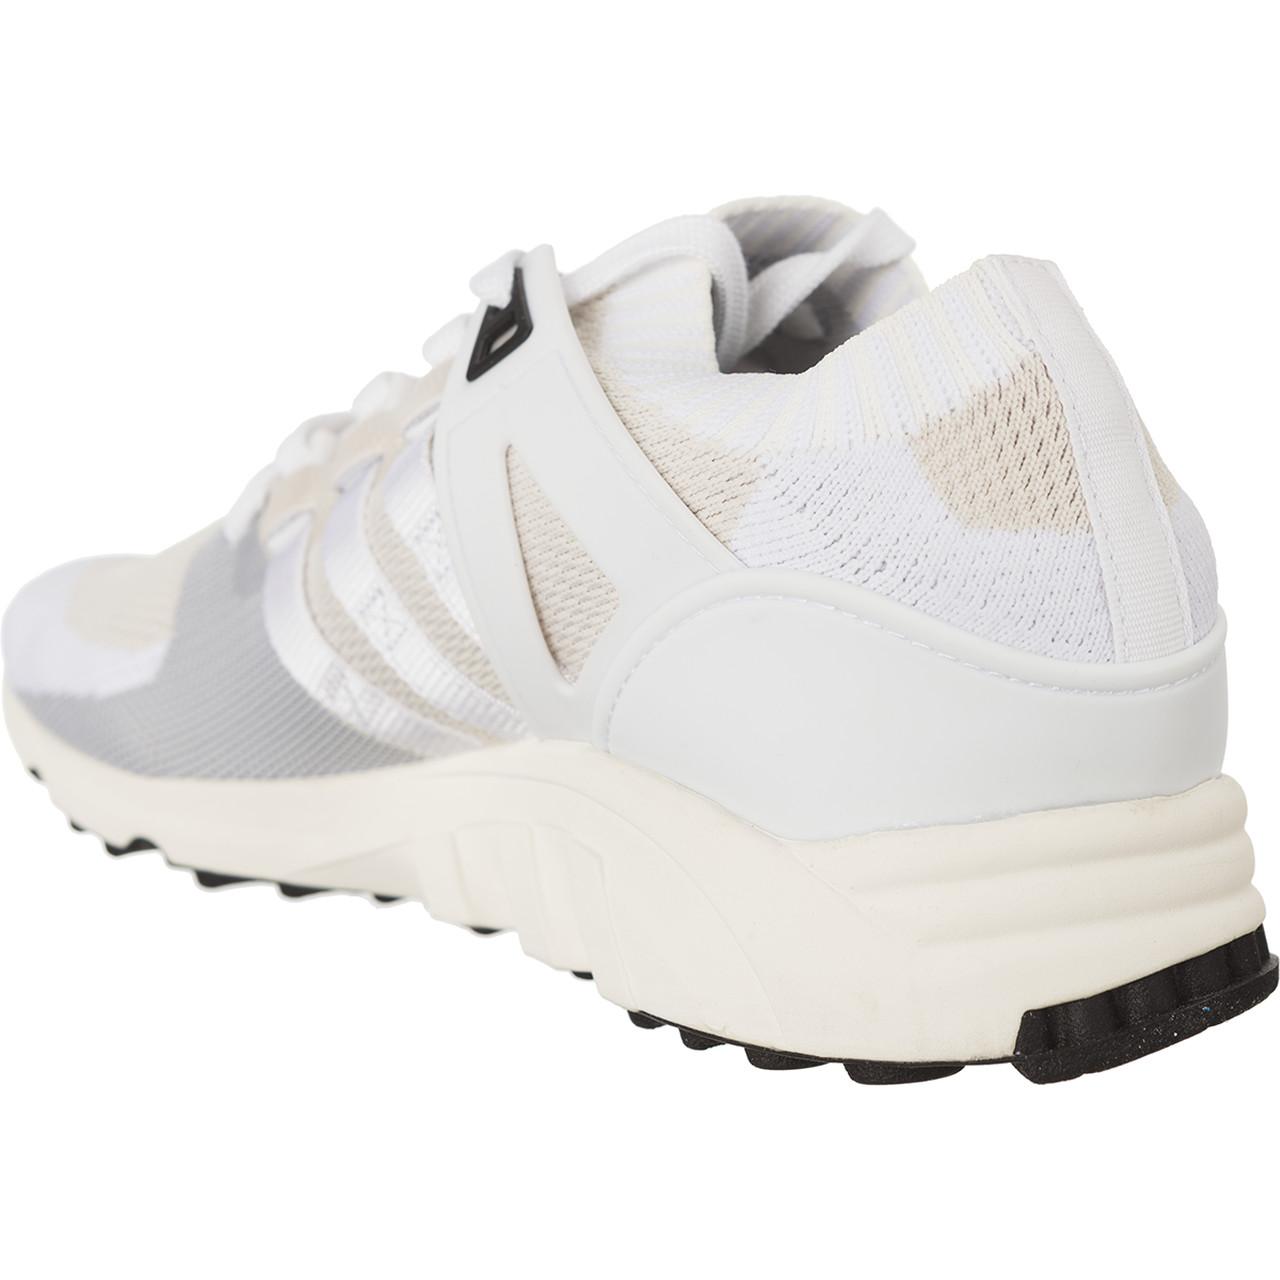 ¡Buty Adidas EQT Support RF PK 507 W puedo creer!